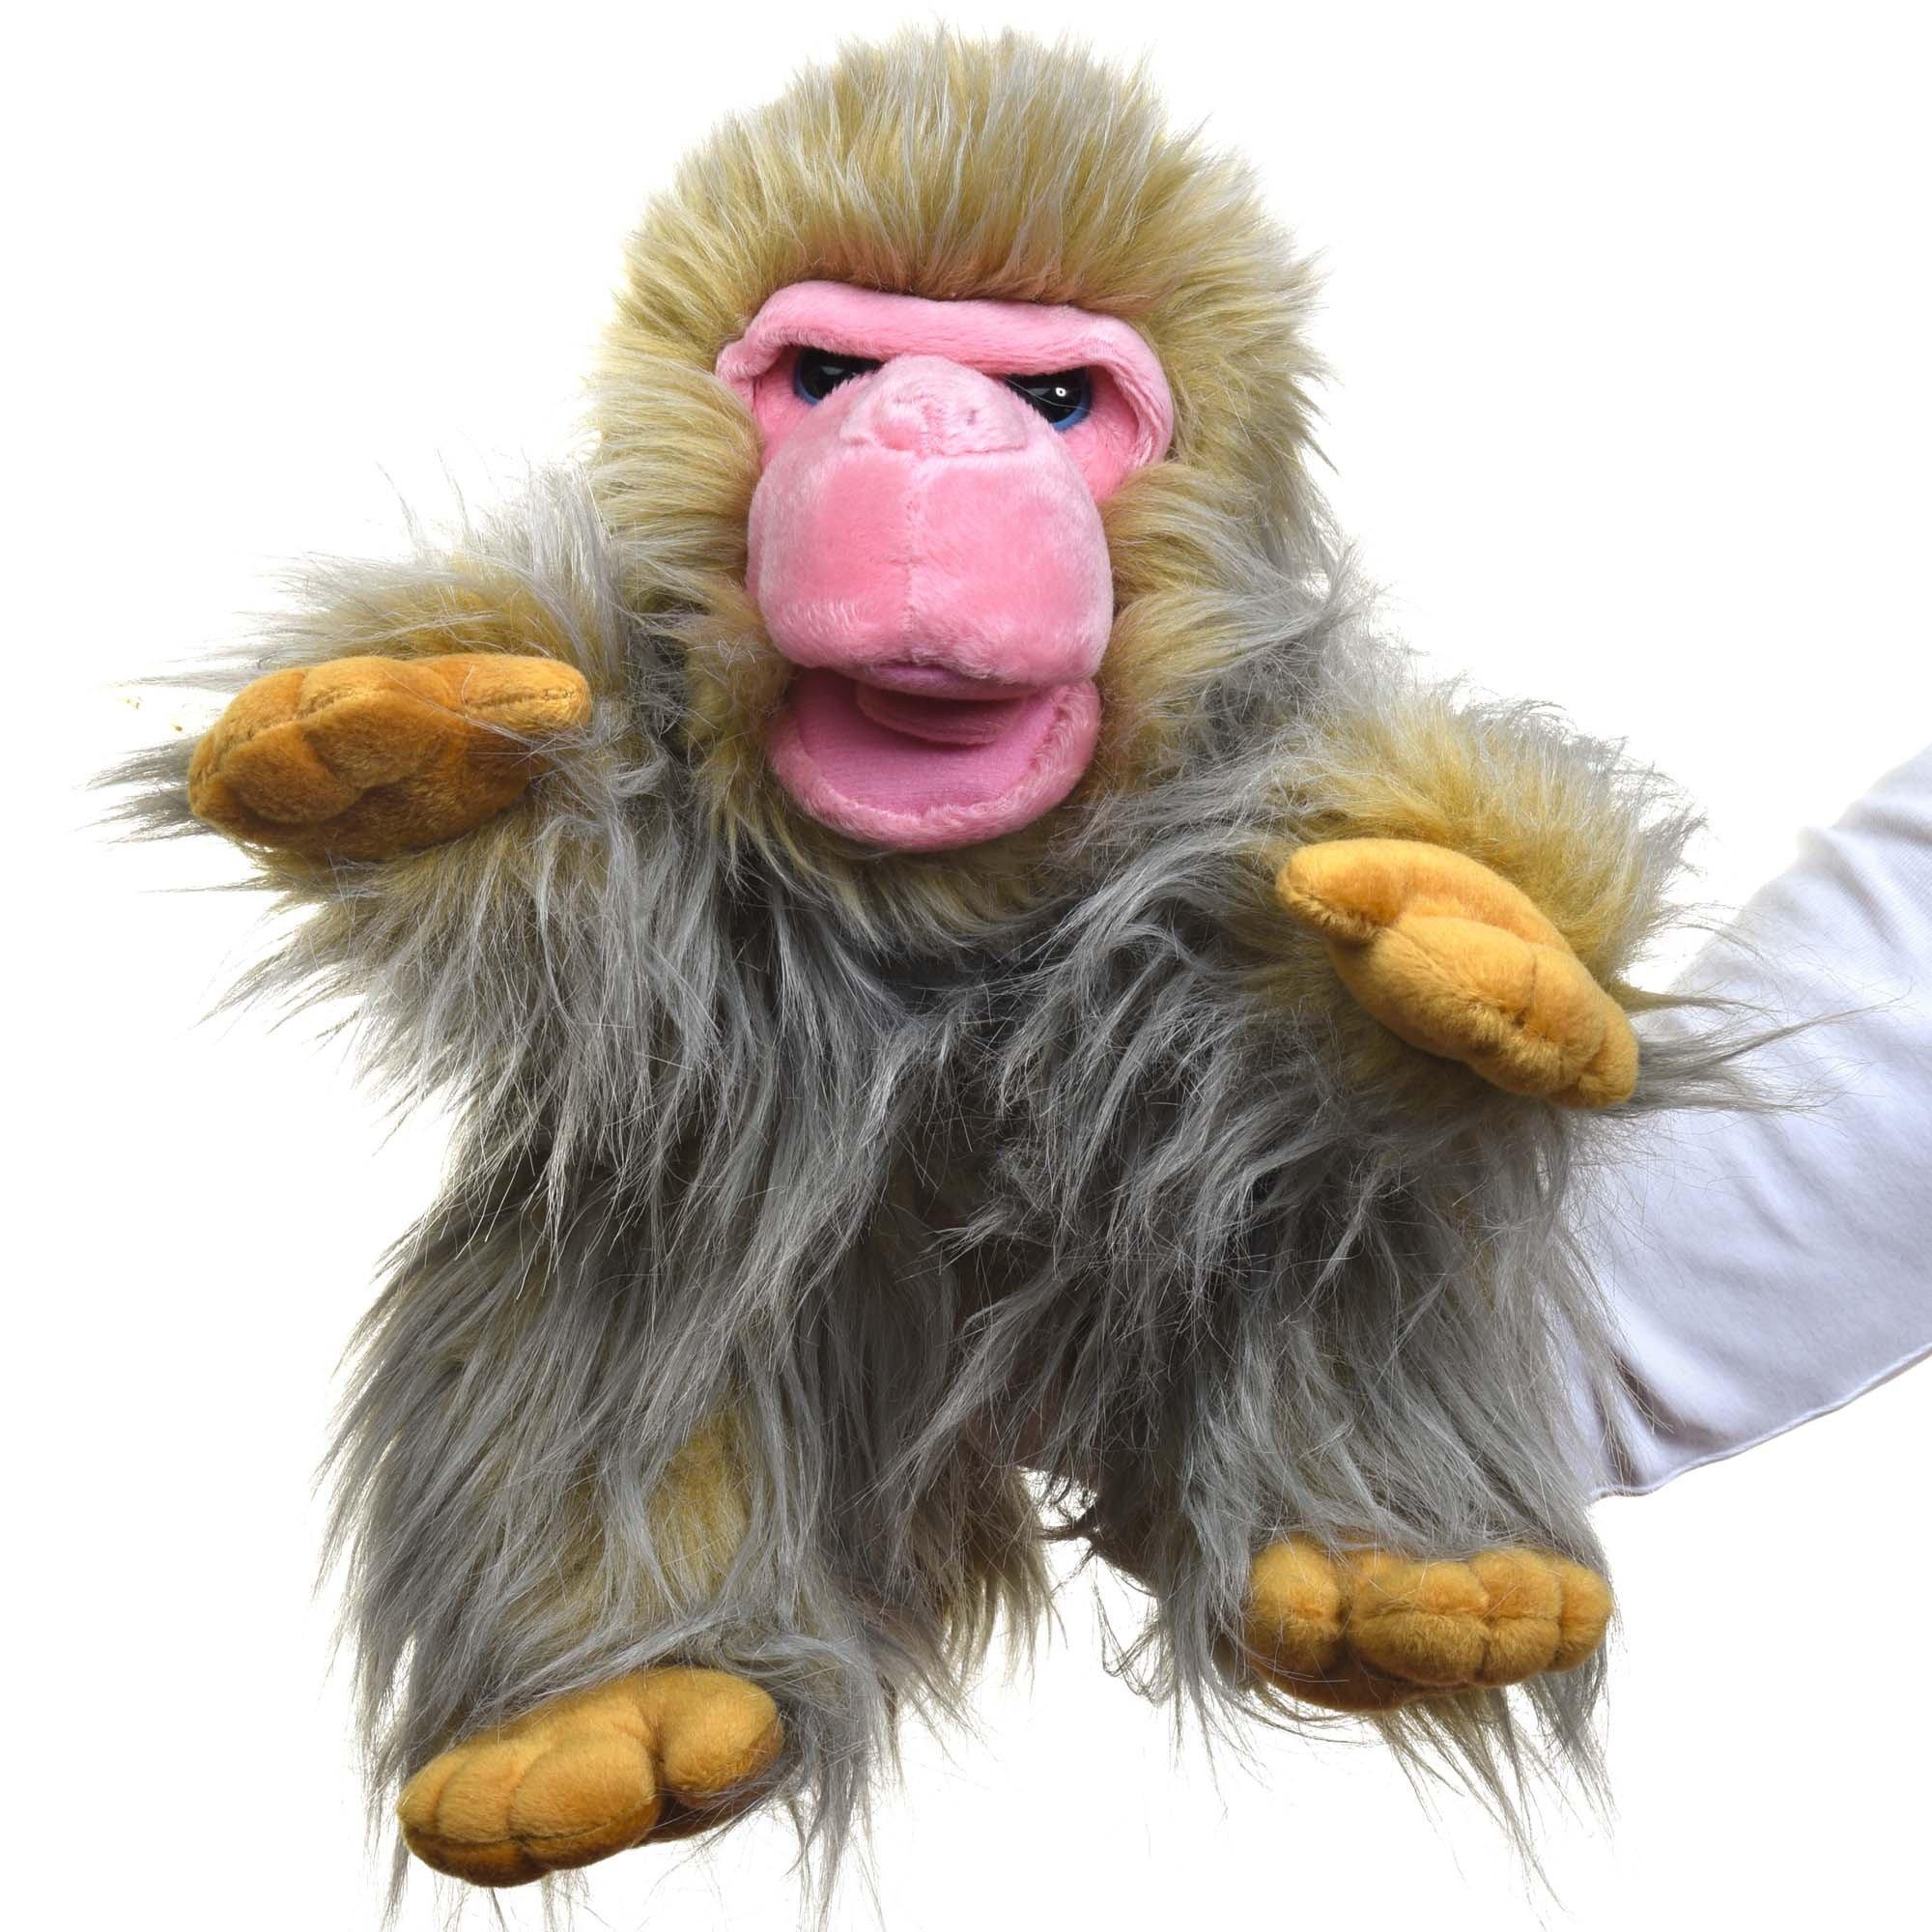 Monkey hand photo